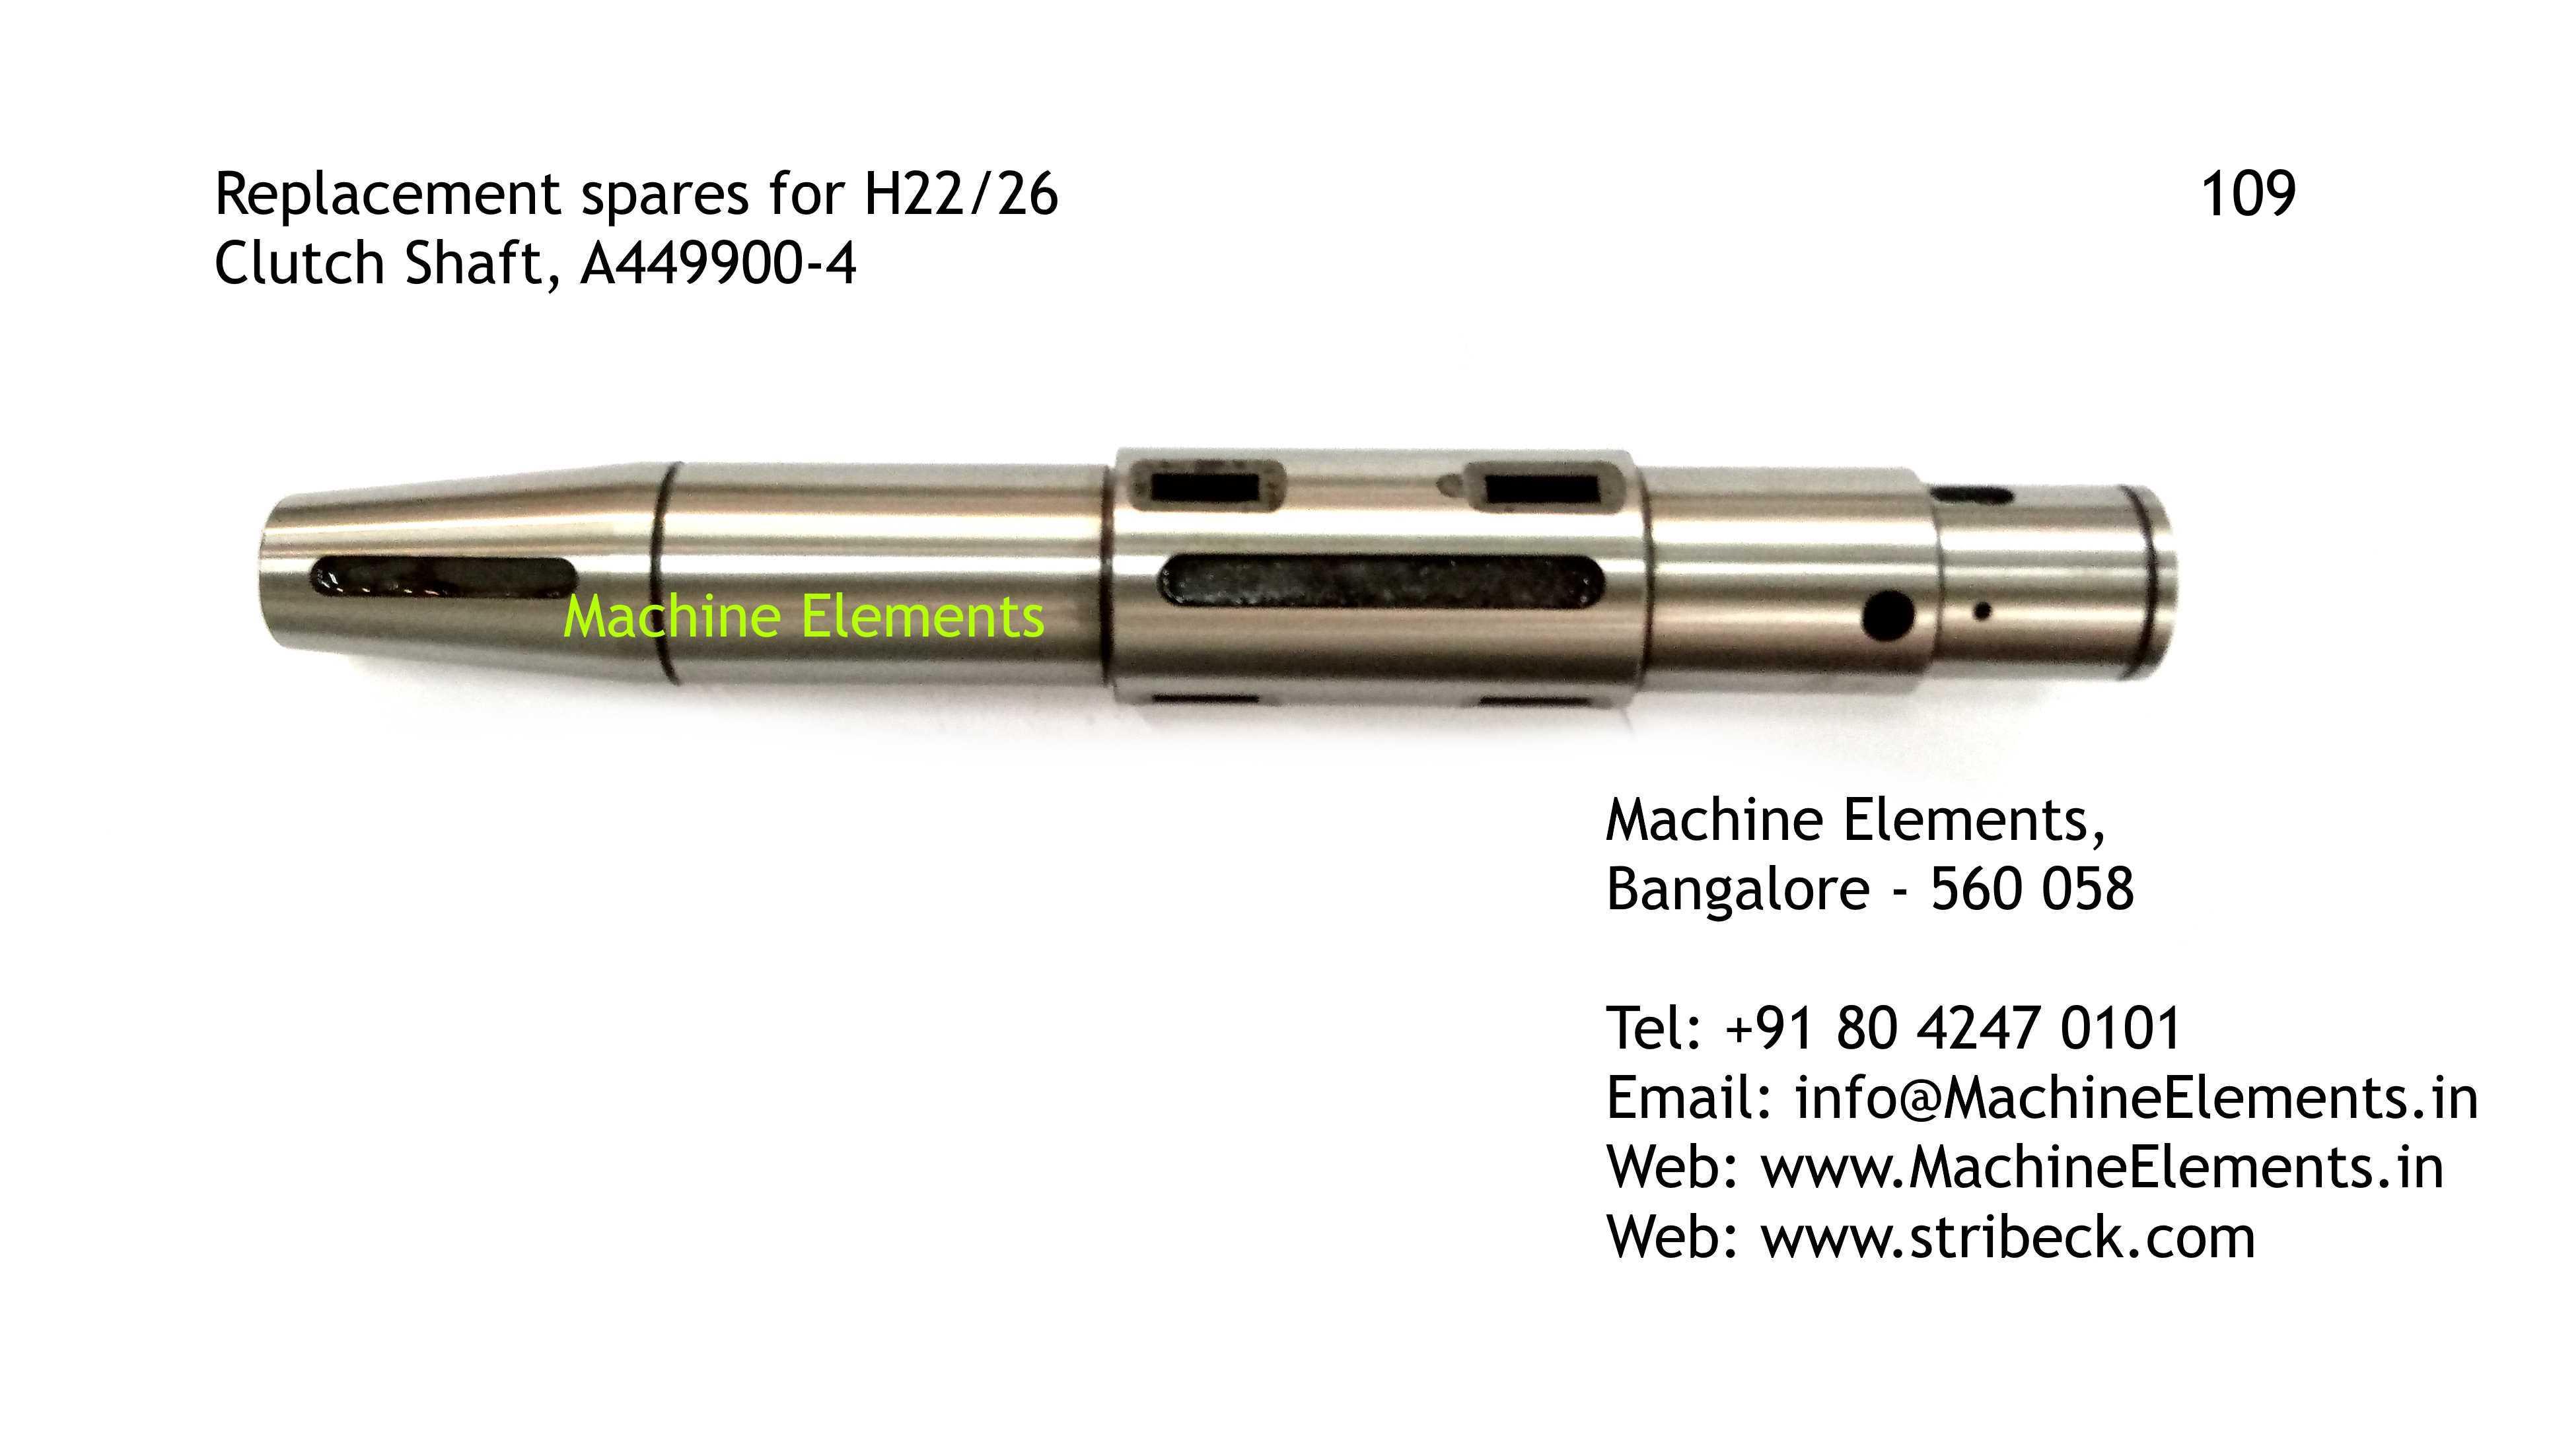 Clutch Shaft, A449900-4